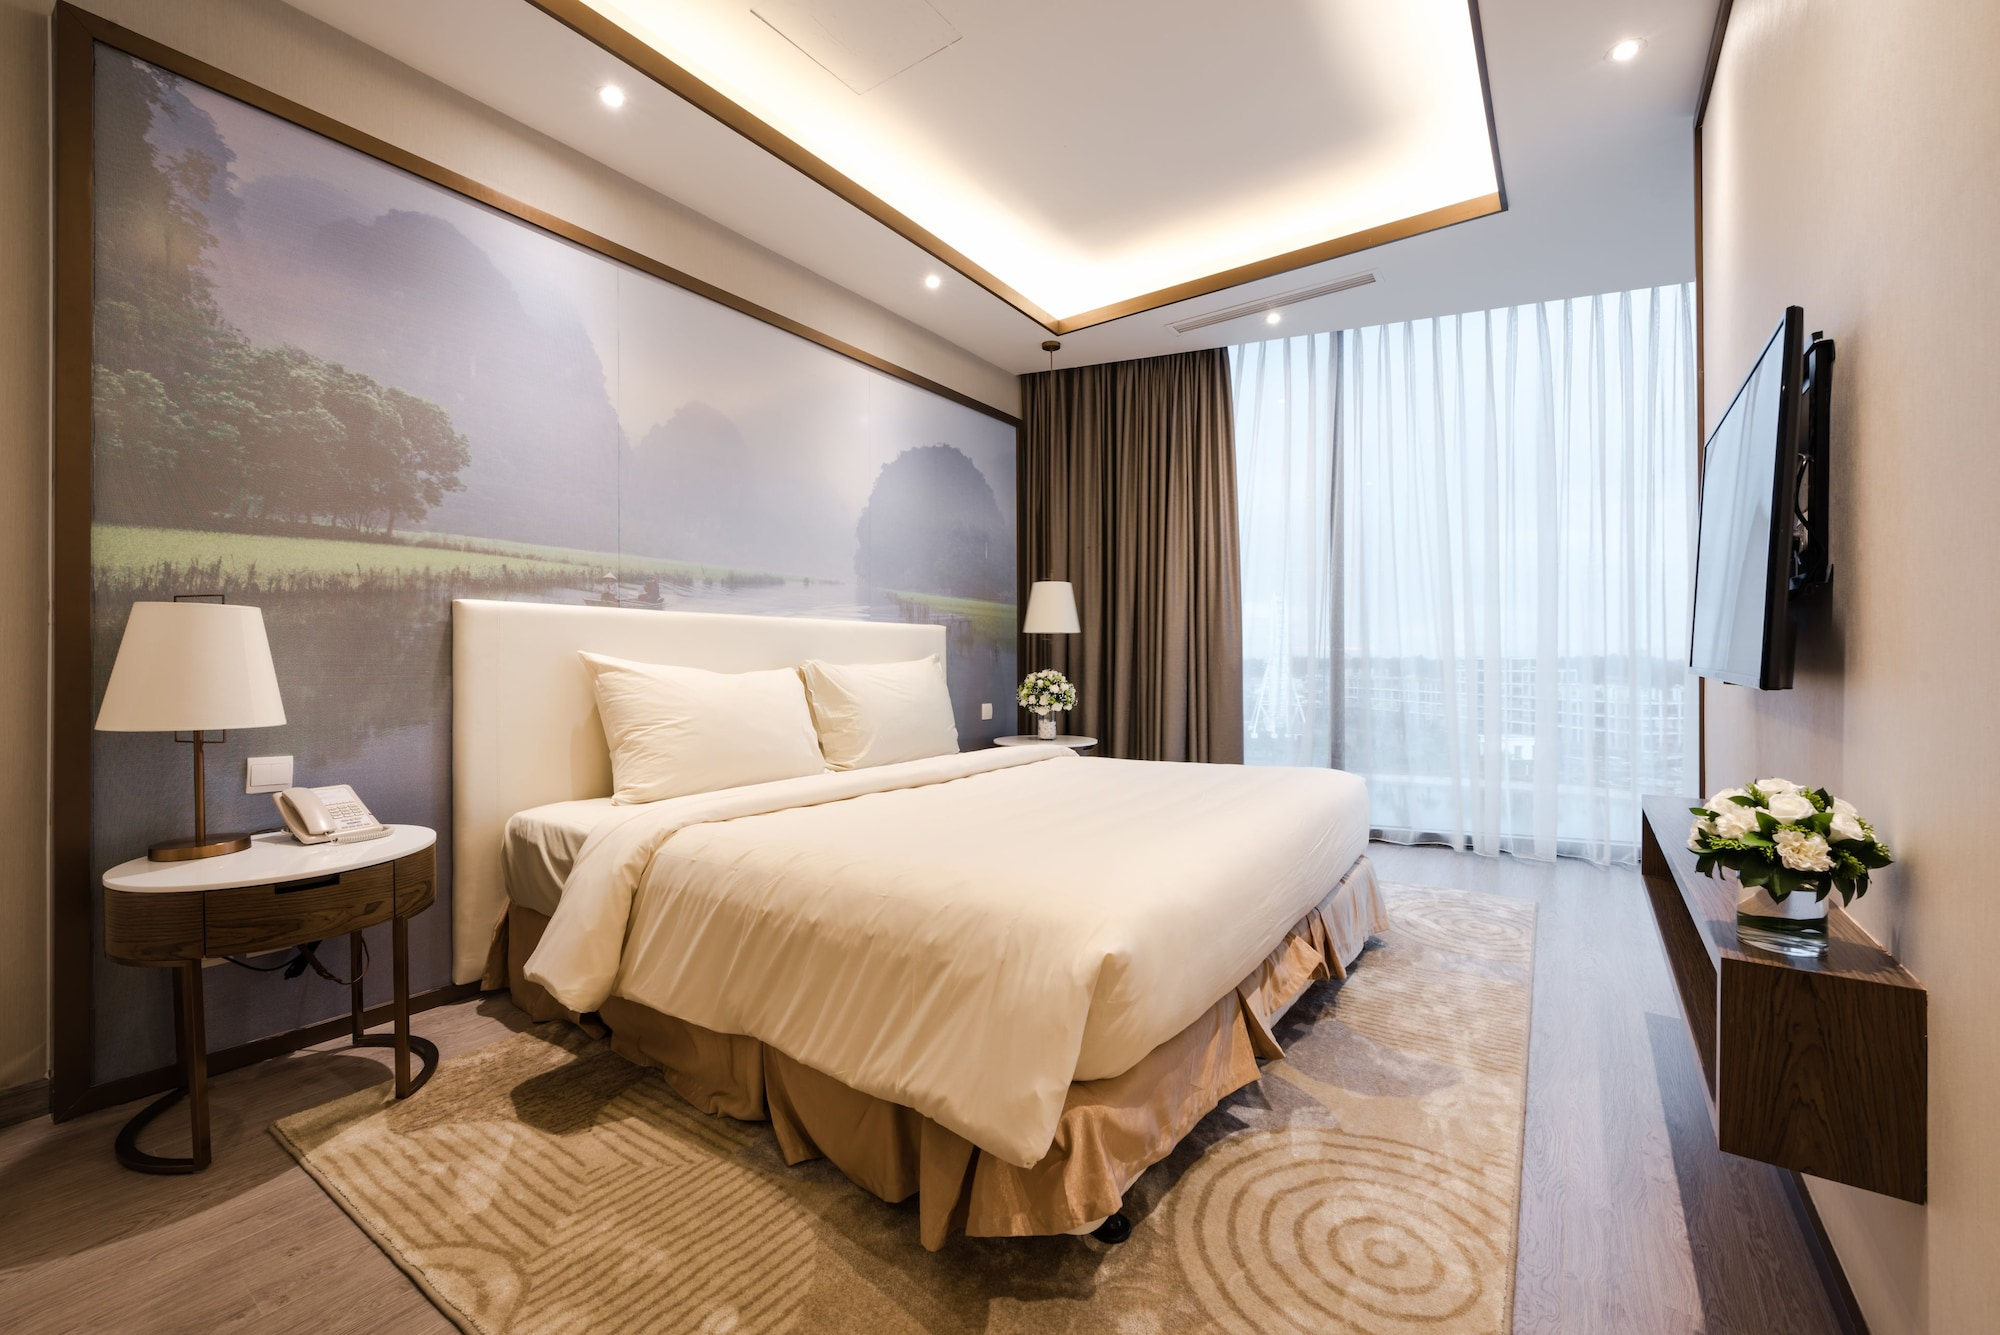 FLC Grand Hotel Samson, Sầm Sơn